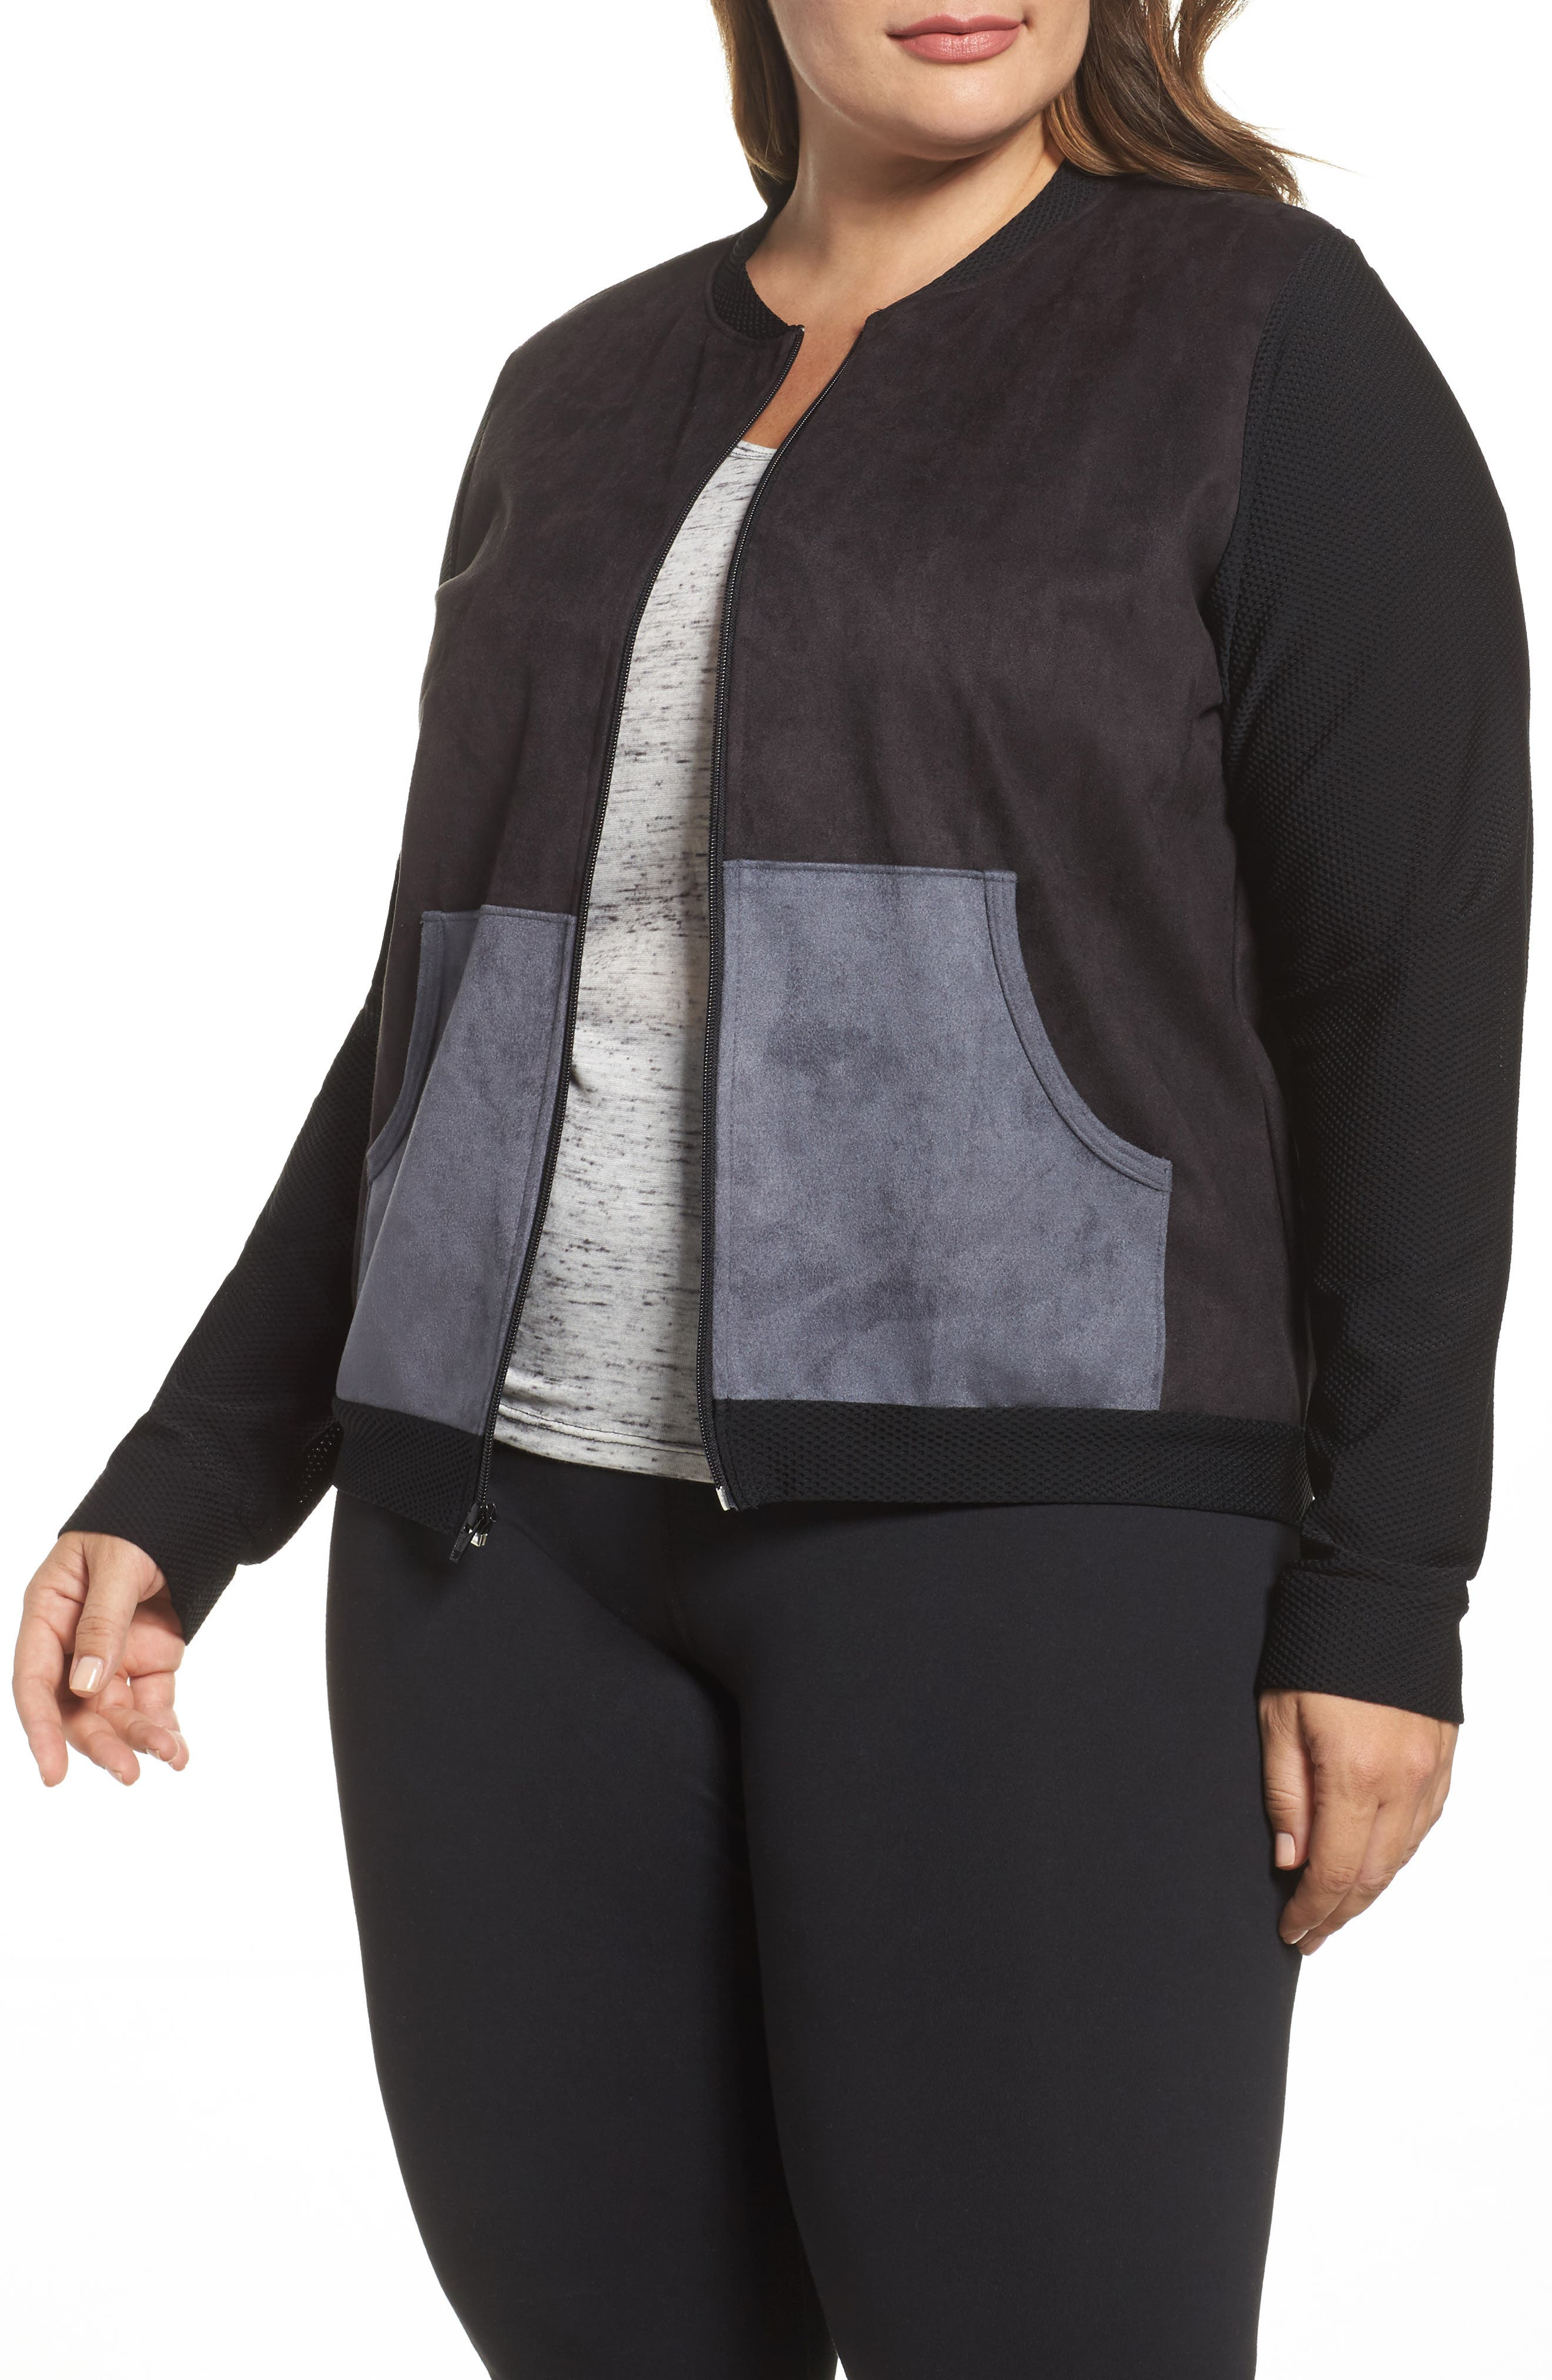 Track Jacket,                         Main,                         color, Black/ Charcoal